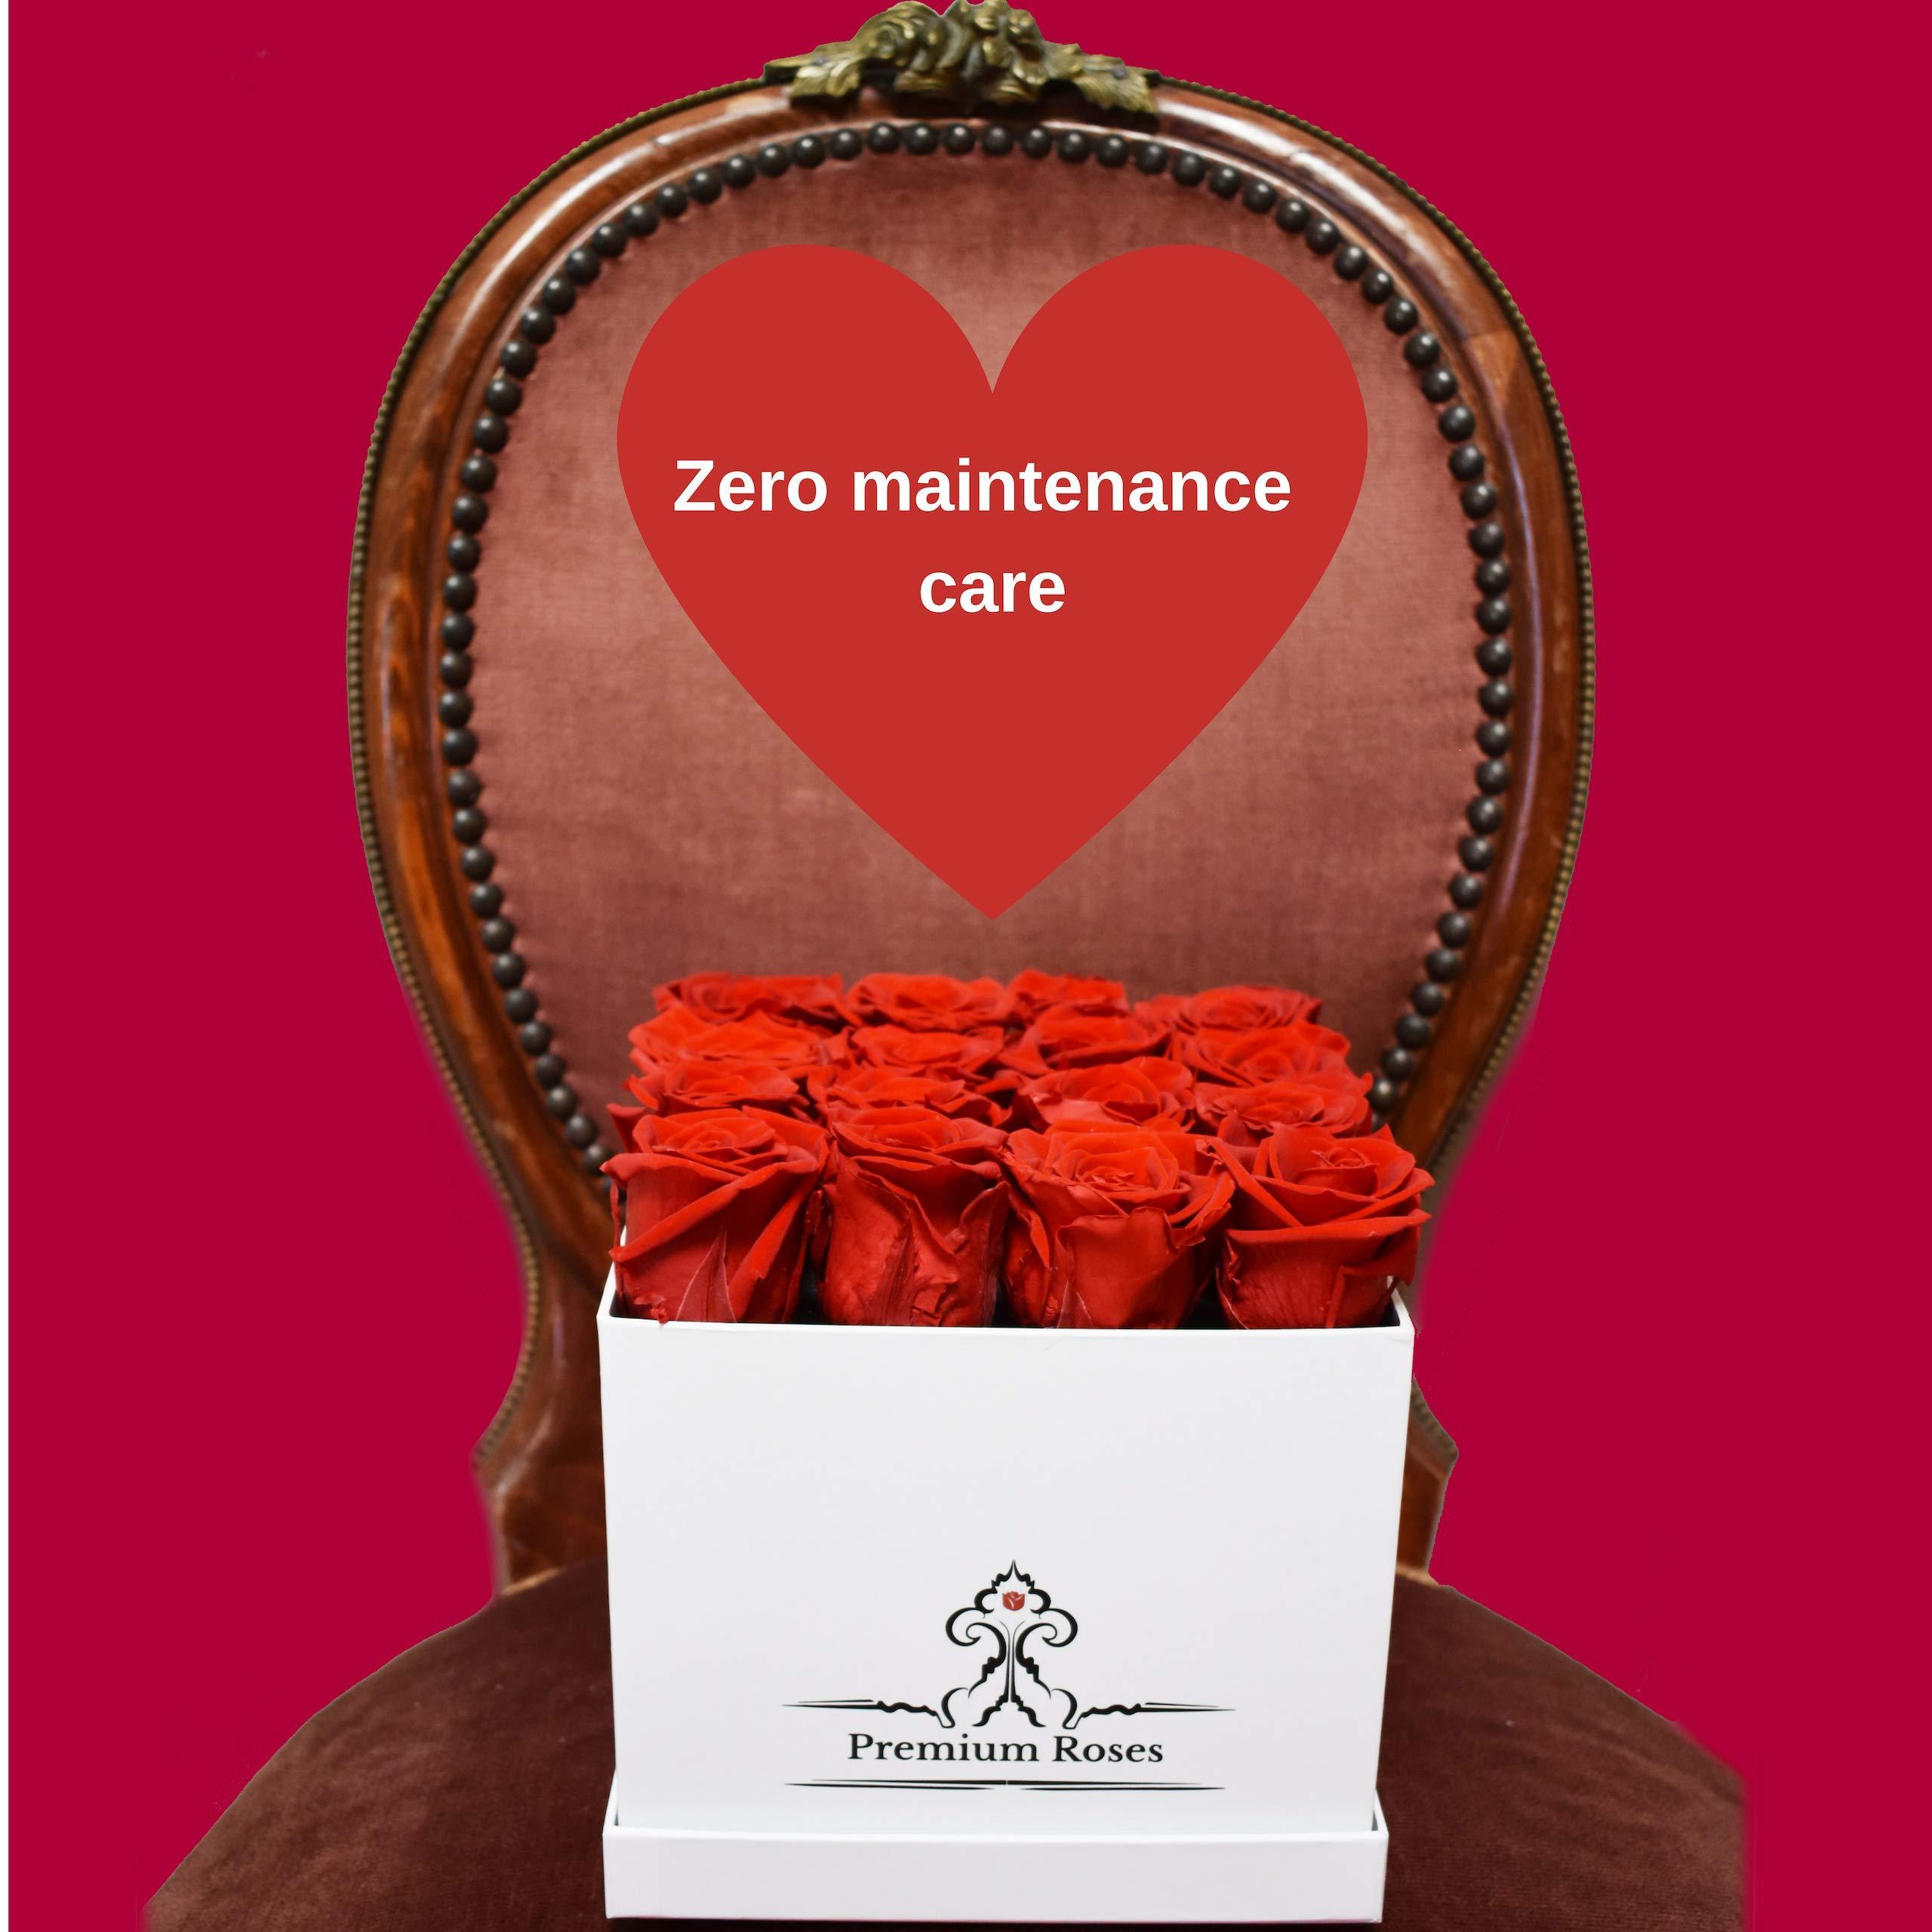 Premium Roses | Model White| Real Roses That Last 365 Days | Fresh Flowers| Roses in a Box (White Box, Medium) by Premium Roses (Image #4)